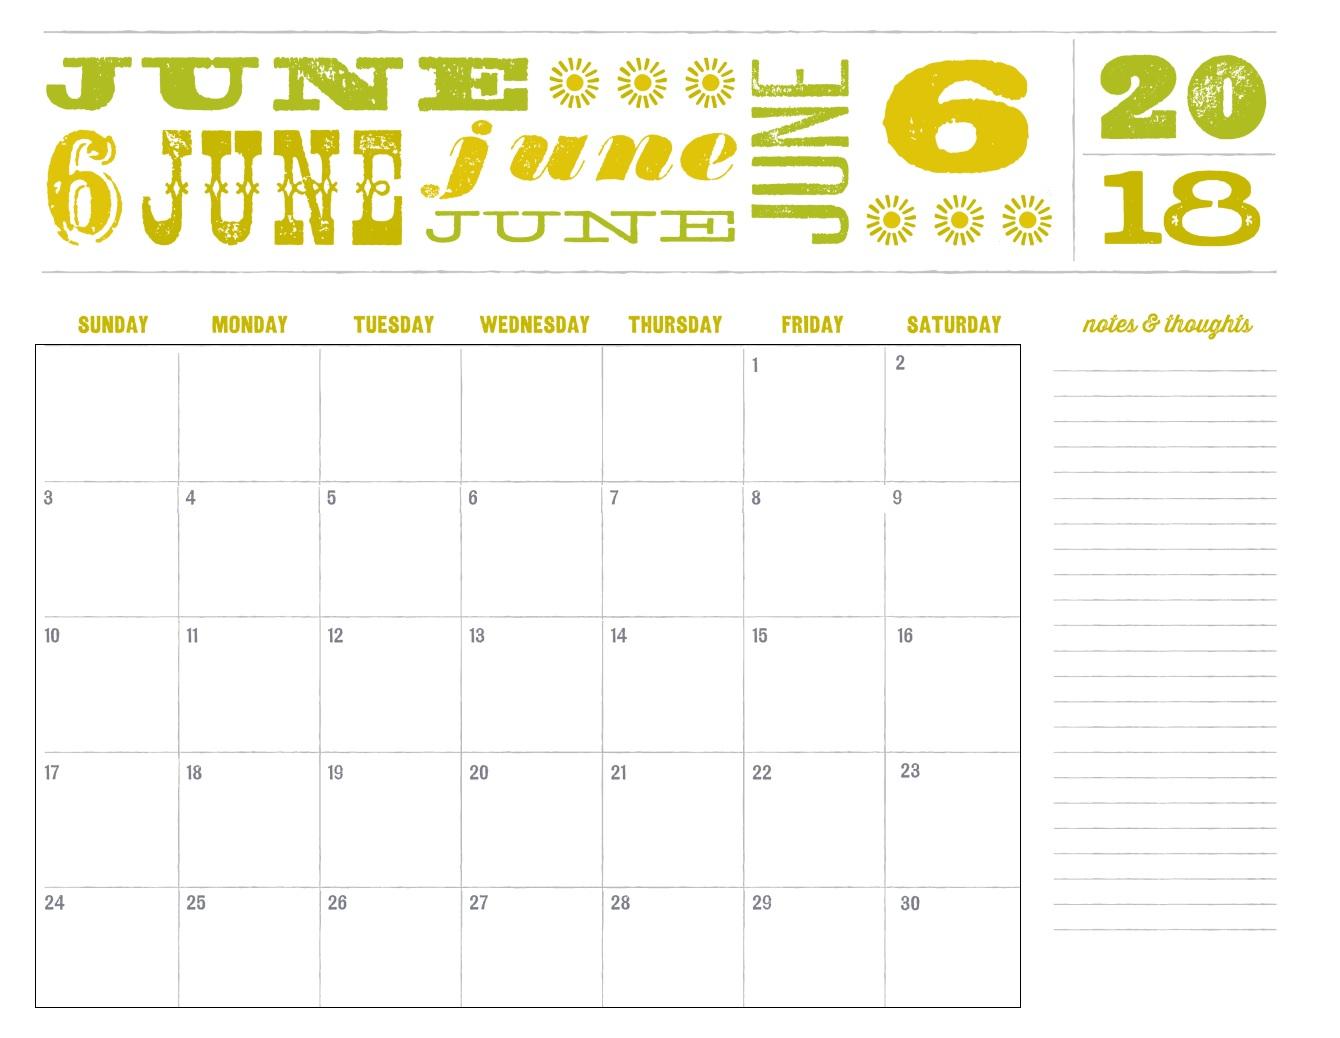 Pretty June 2018 Calendar - Free Printable Calendar, Blank within Blank Calendar Pretty